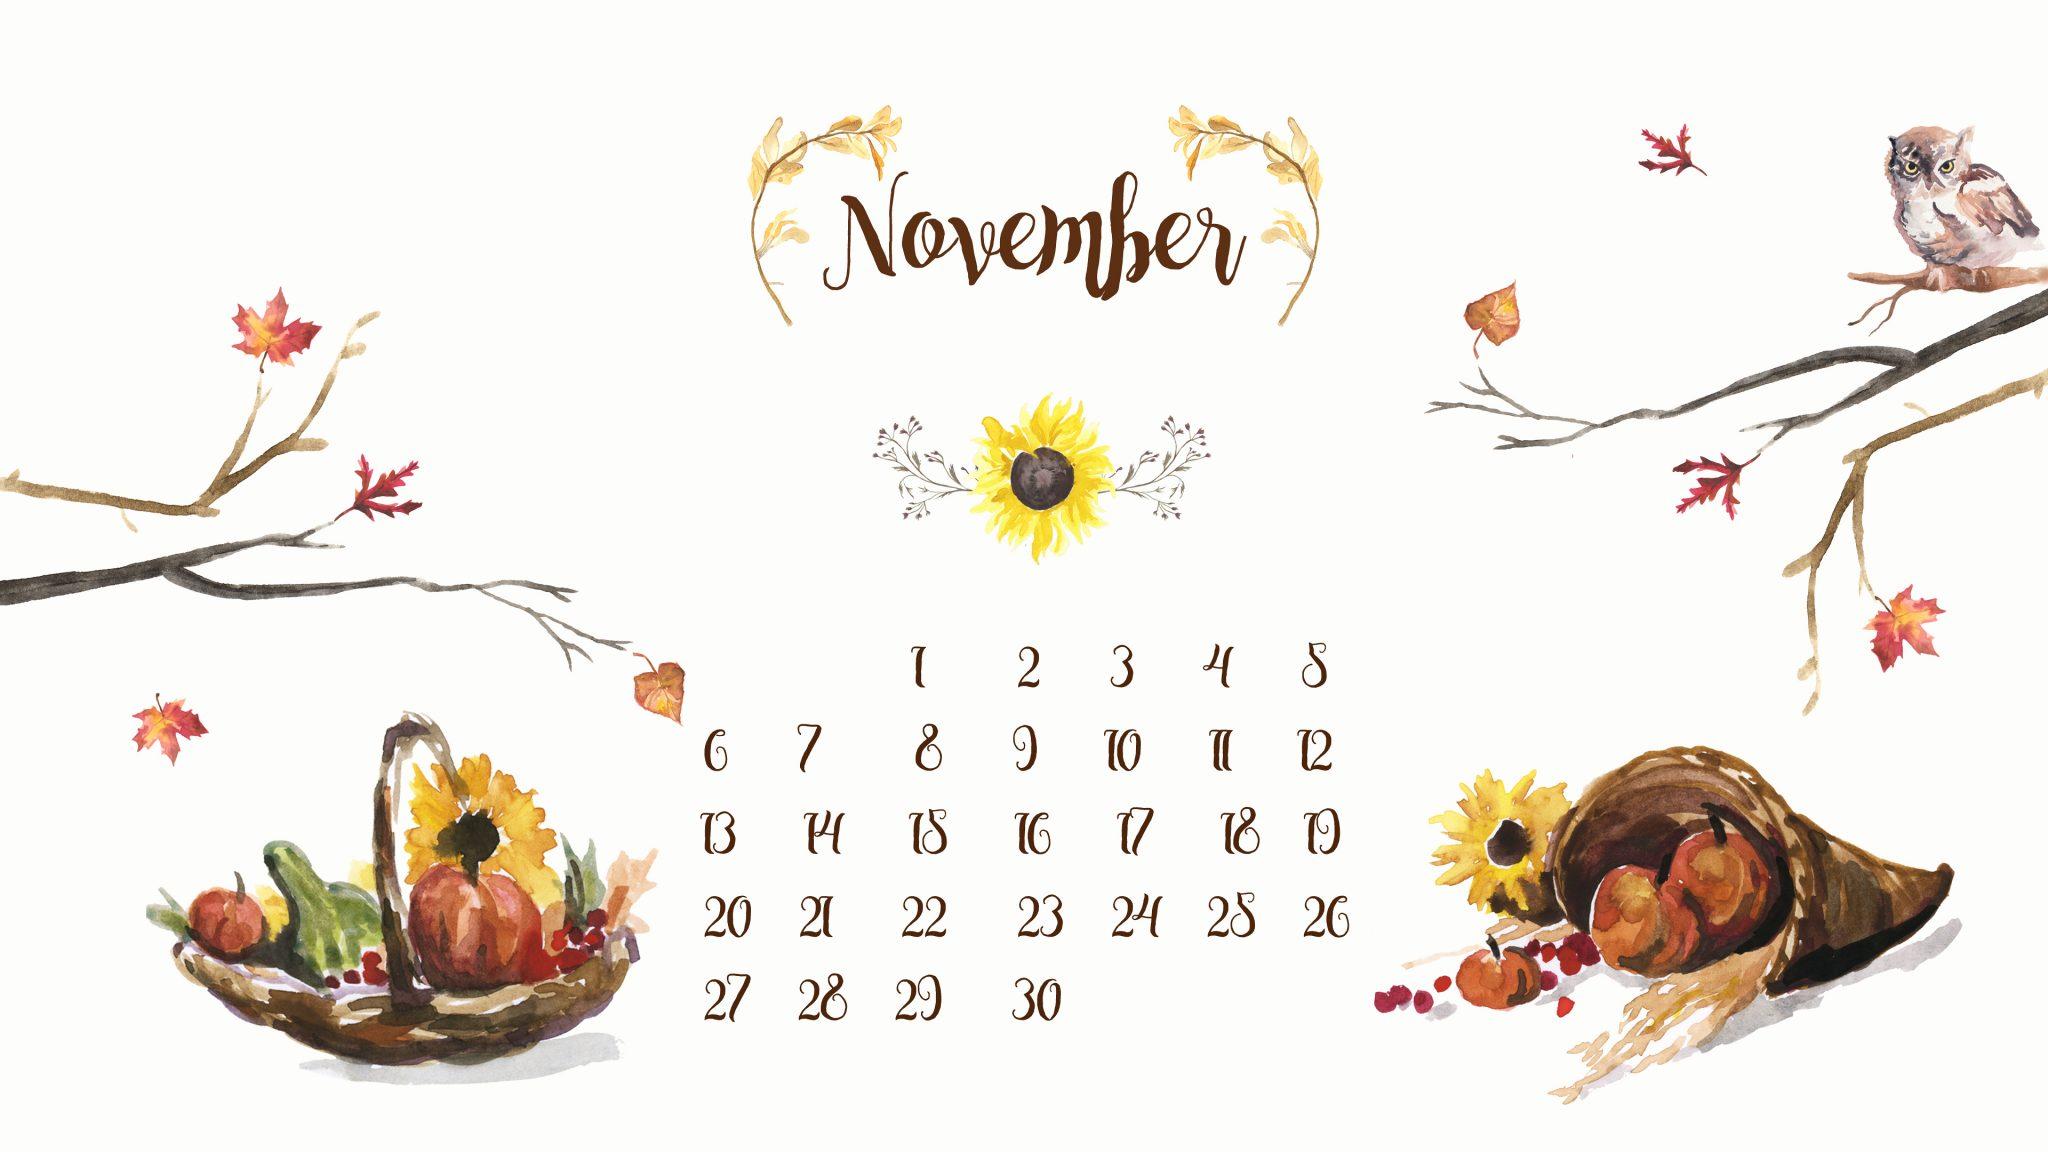 November 2019 Screensaver Calendar Wallpaper